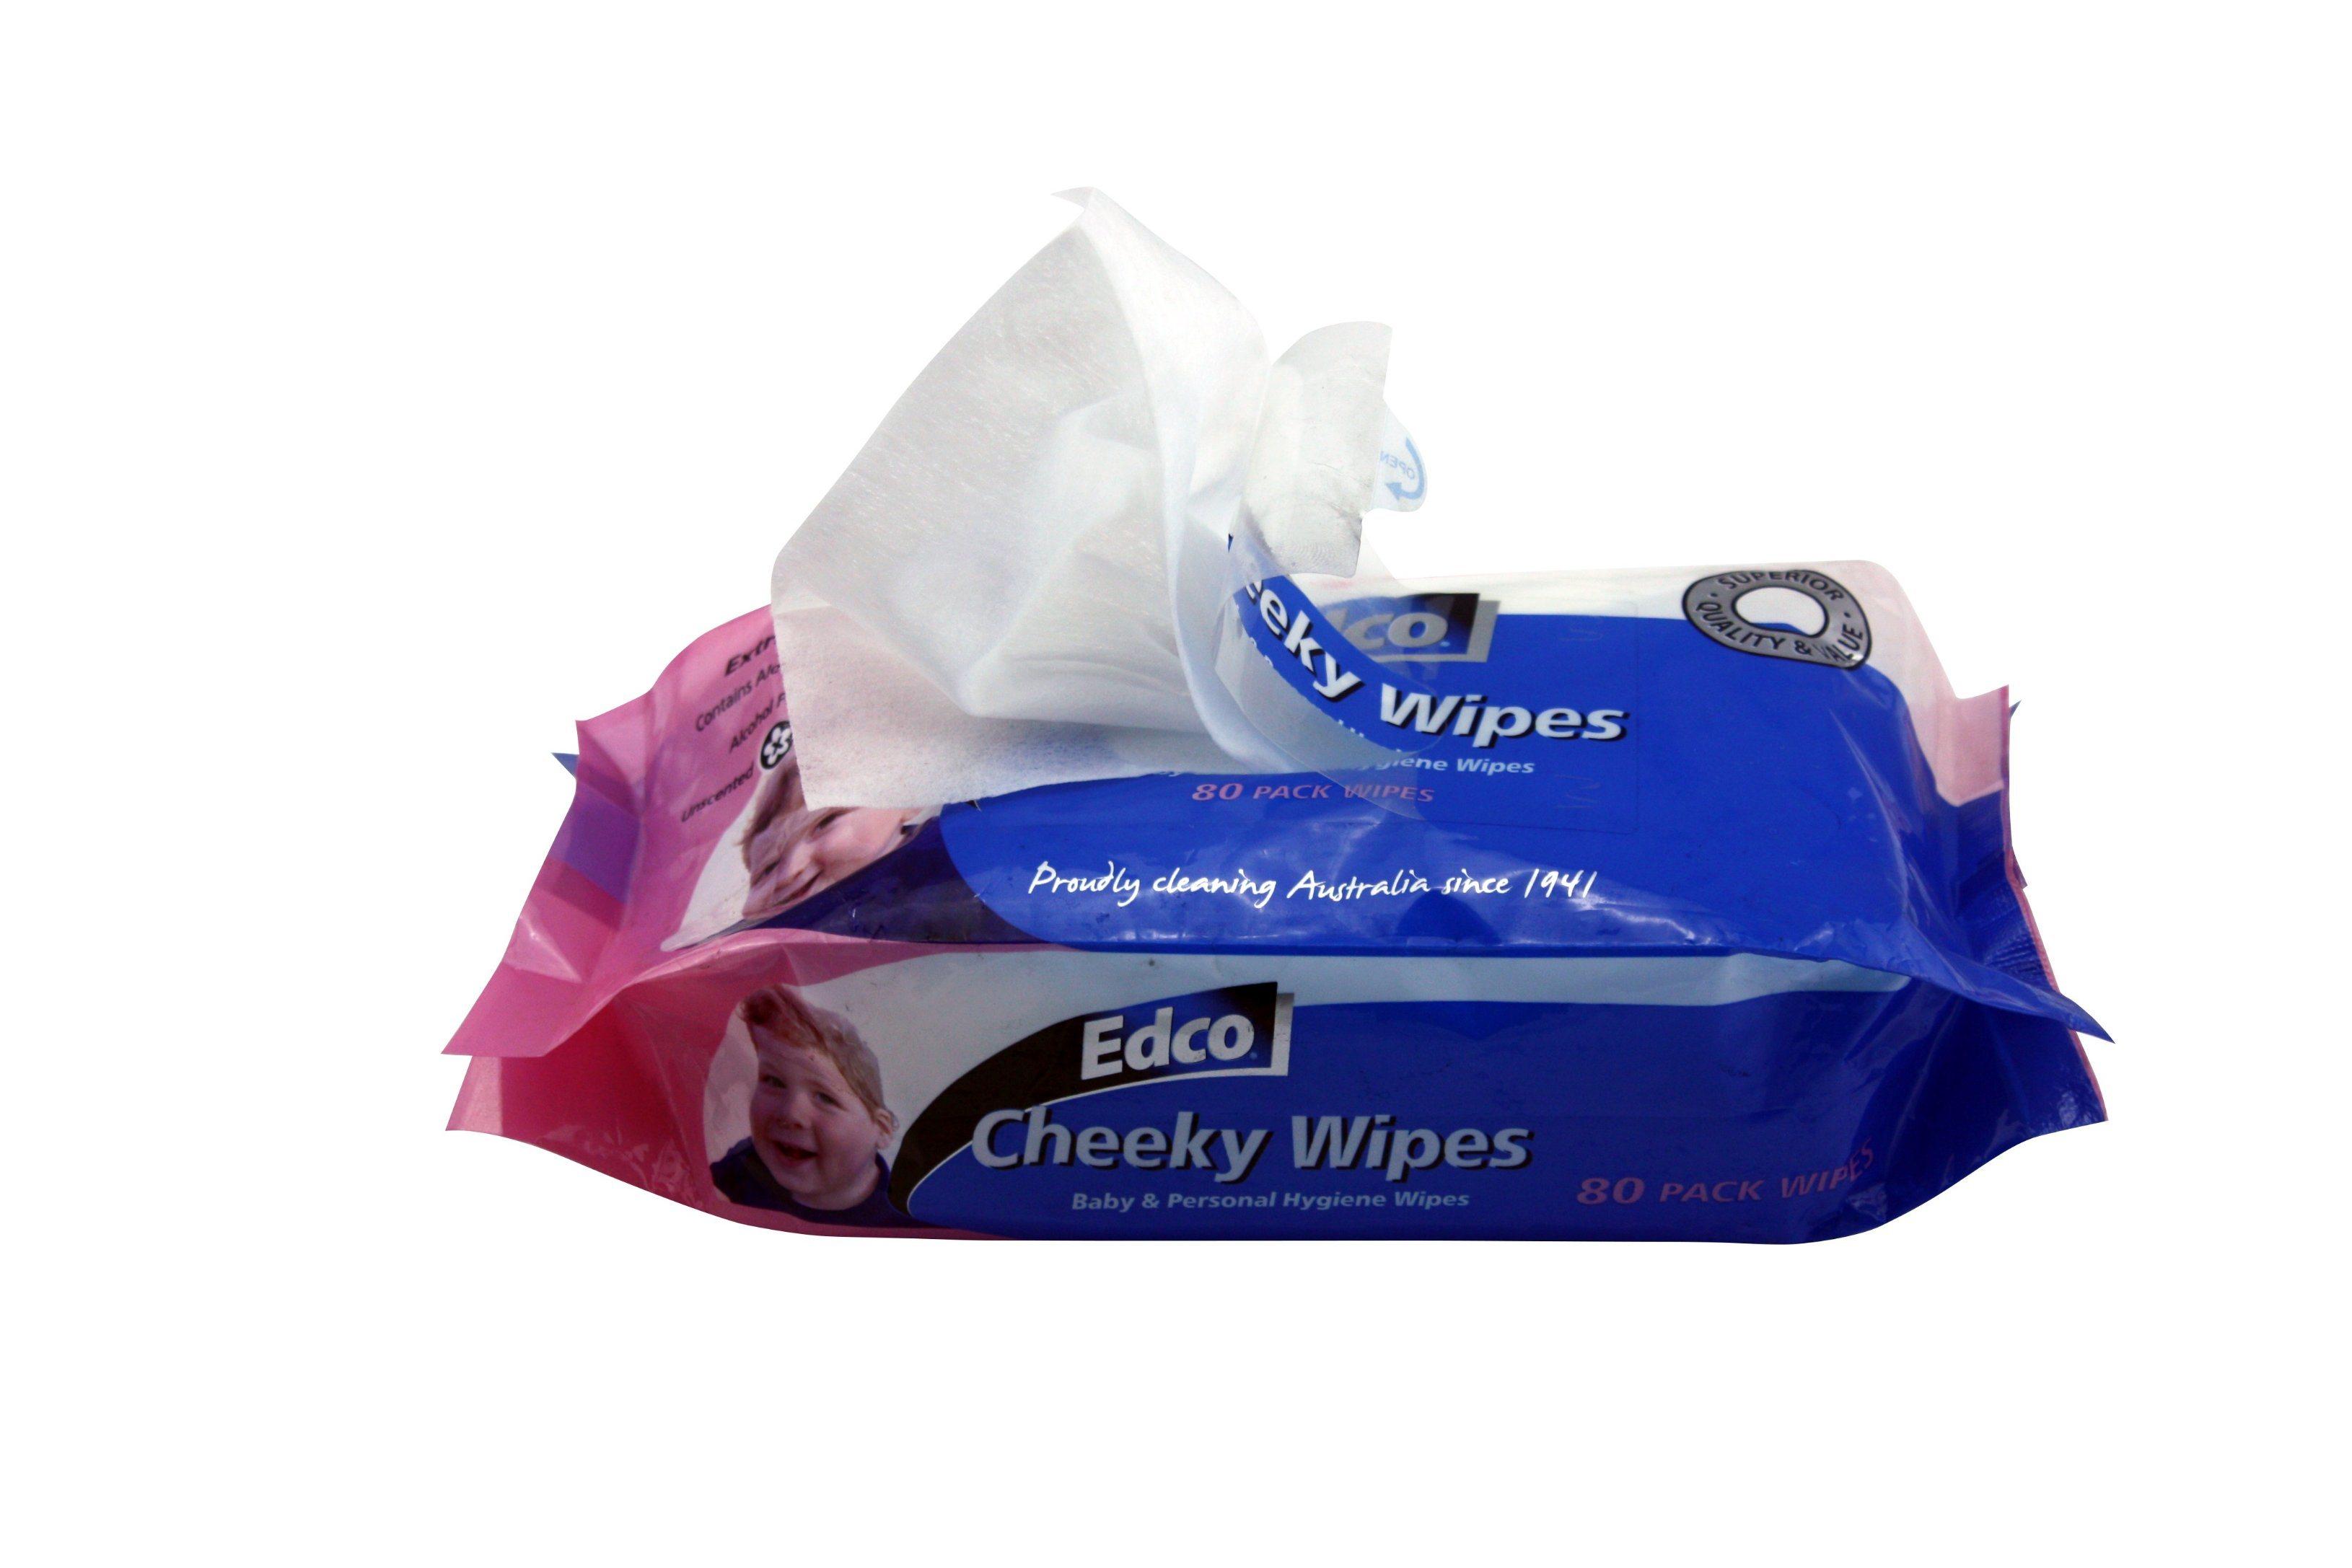 Professional Flushable Wipes, Spunlace Nonwoven Fabric Organic Baby Wipes